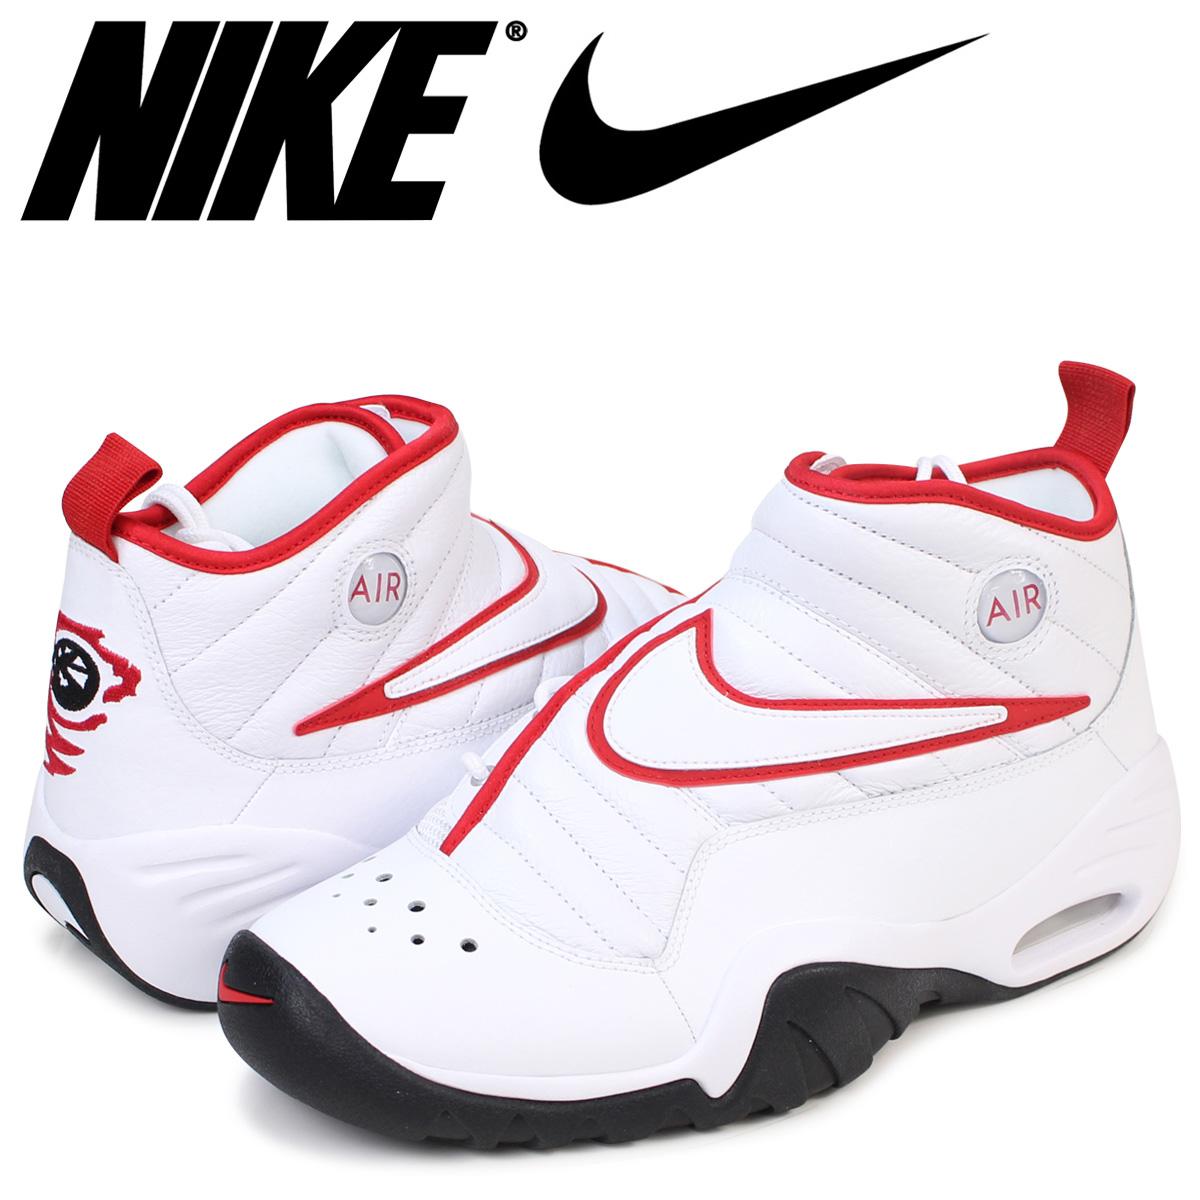 NIKE ナイキ エアシェイク スニーカー AIR SHAKE NDESTRUKT エア シェイク インデストラクト 880869-100 メンズ 靴 ブルズカラー ホワイト 白 [3/9 再入荷]